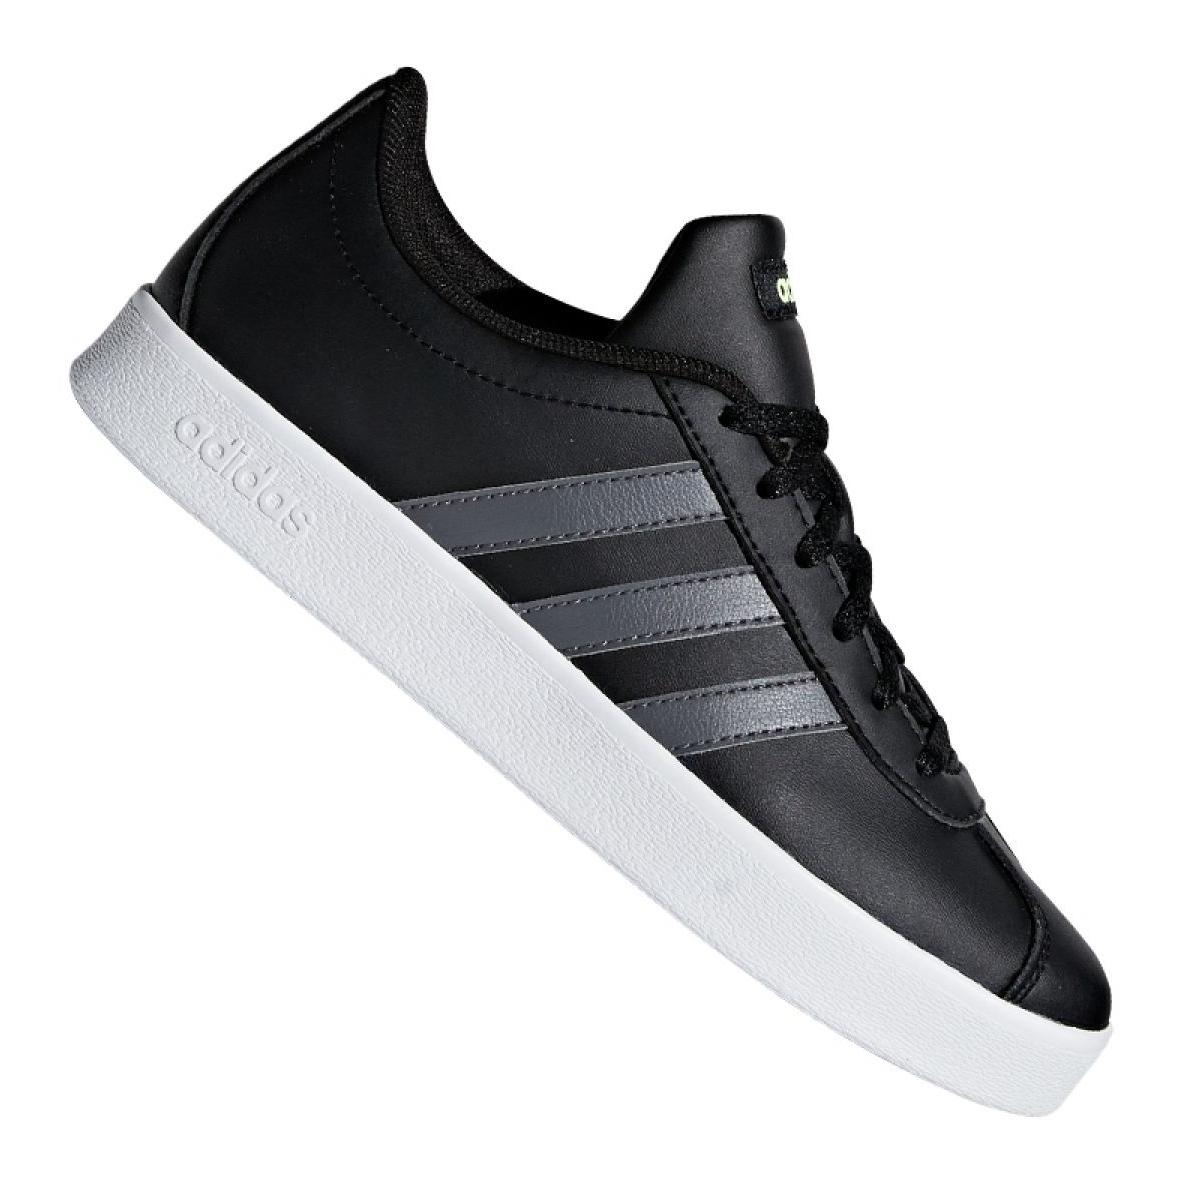 Buty adidas Vl Court 2.0 Jr F36381 czarne